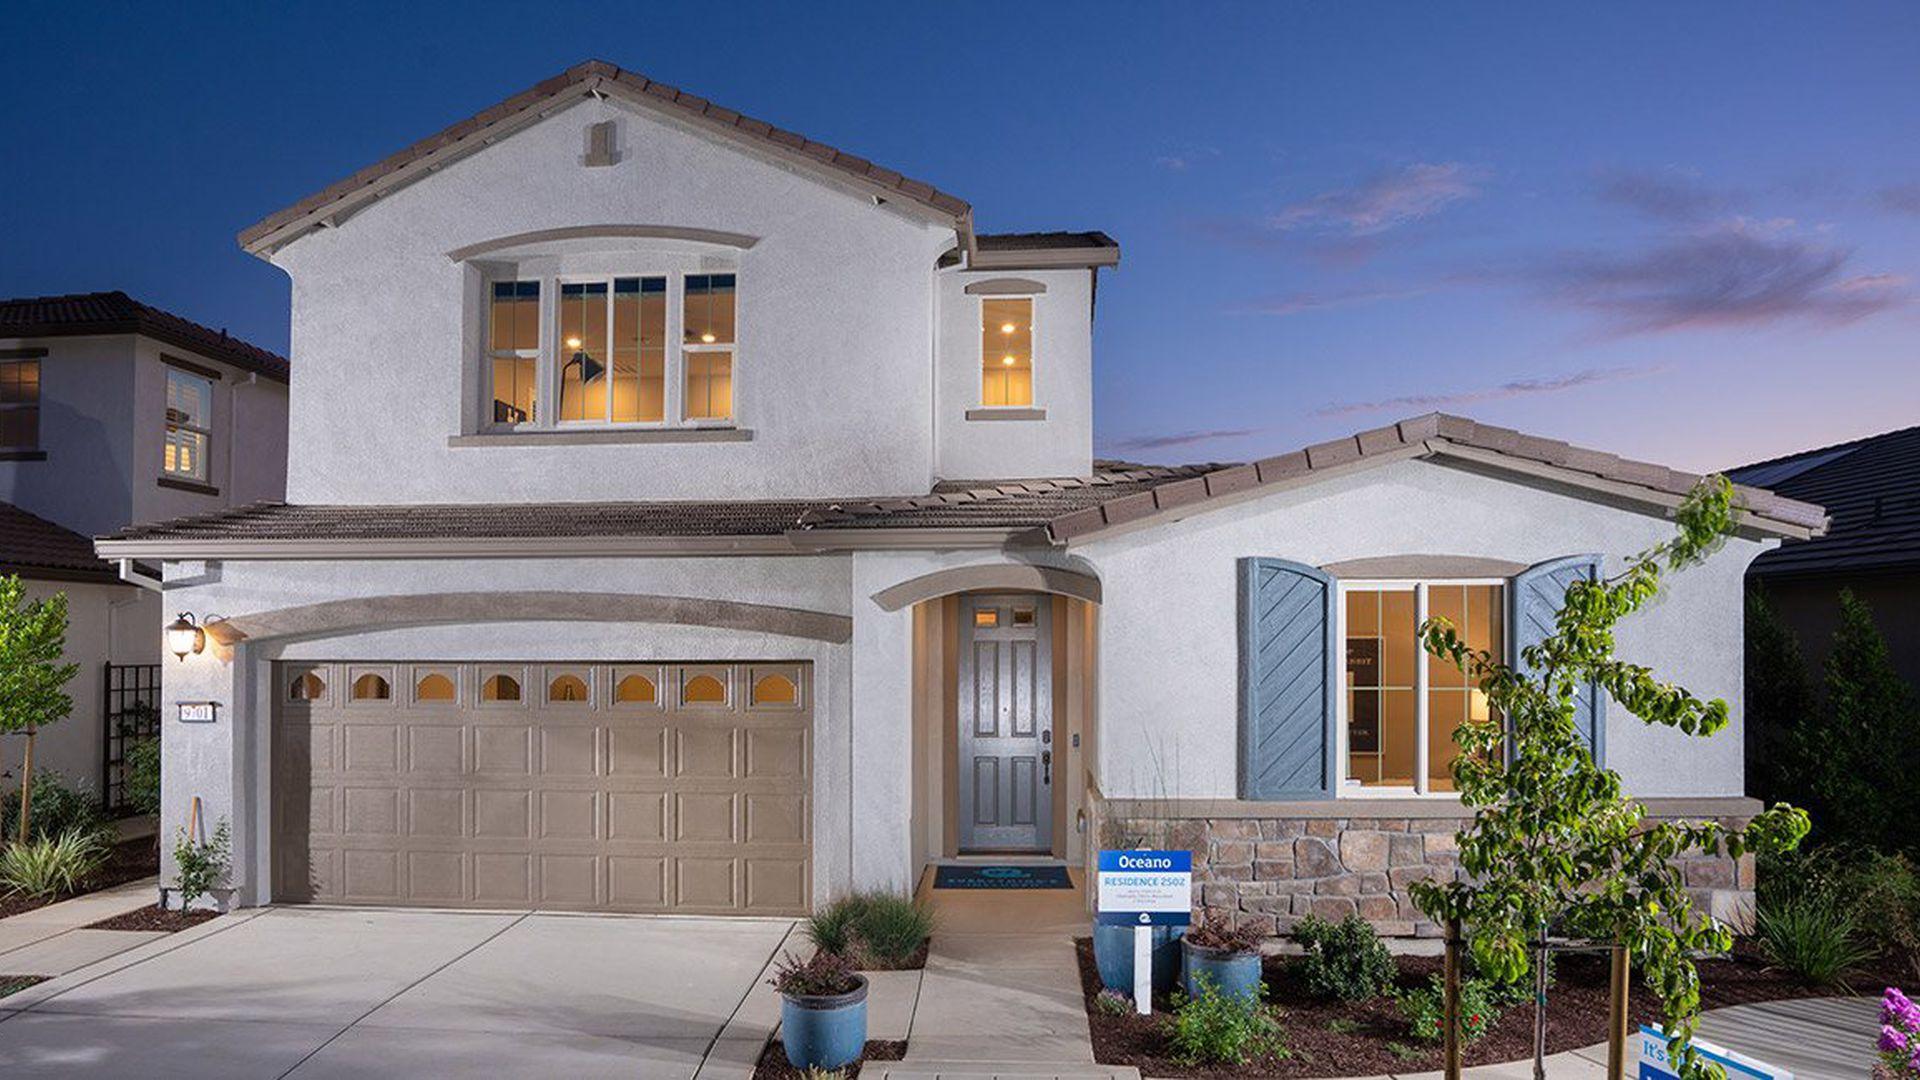 Elk Grove Real Estate - Elk Grove CA Homes For Sale | Zillow